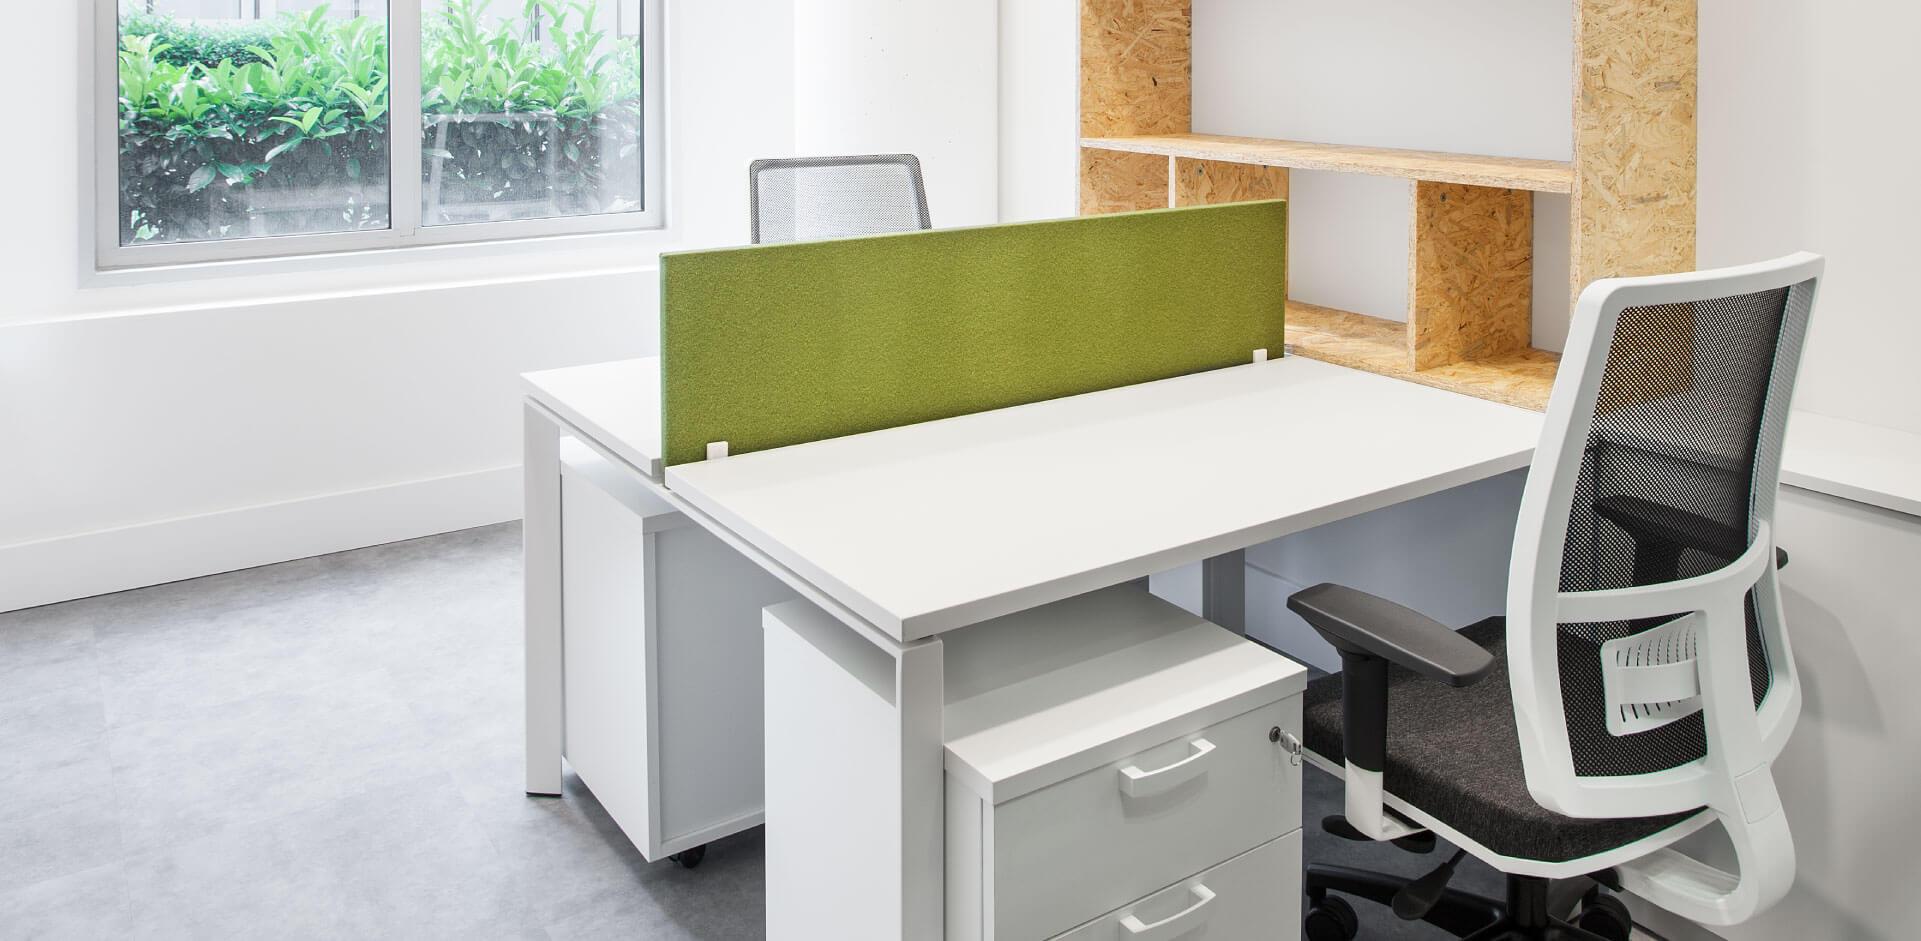 Despacho 2 Pax